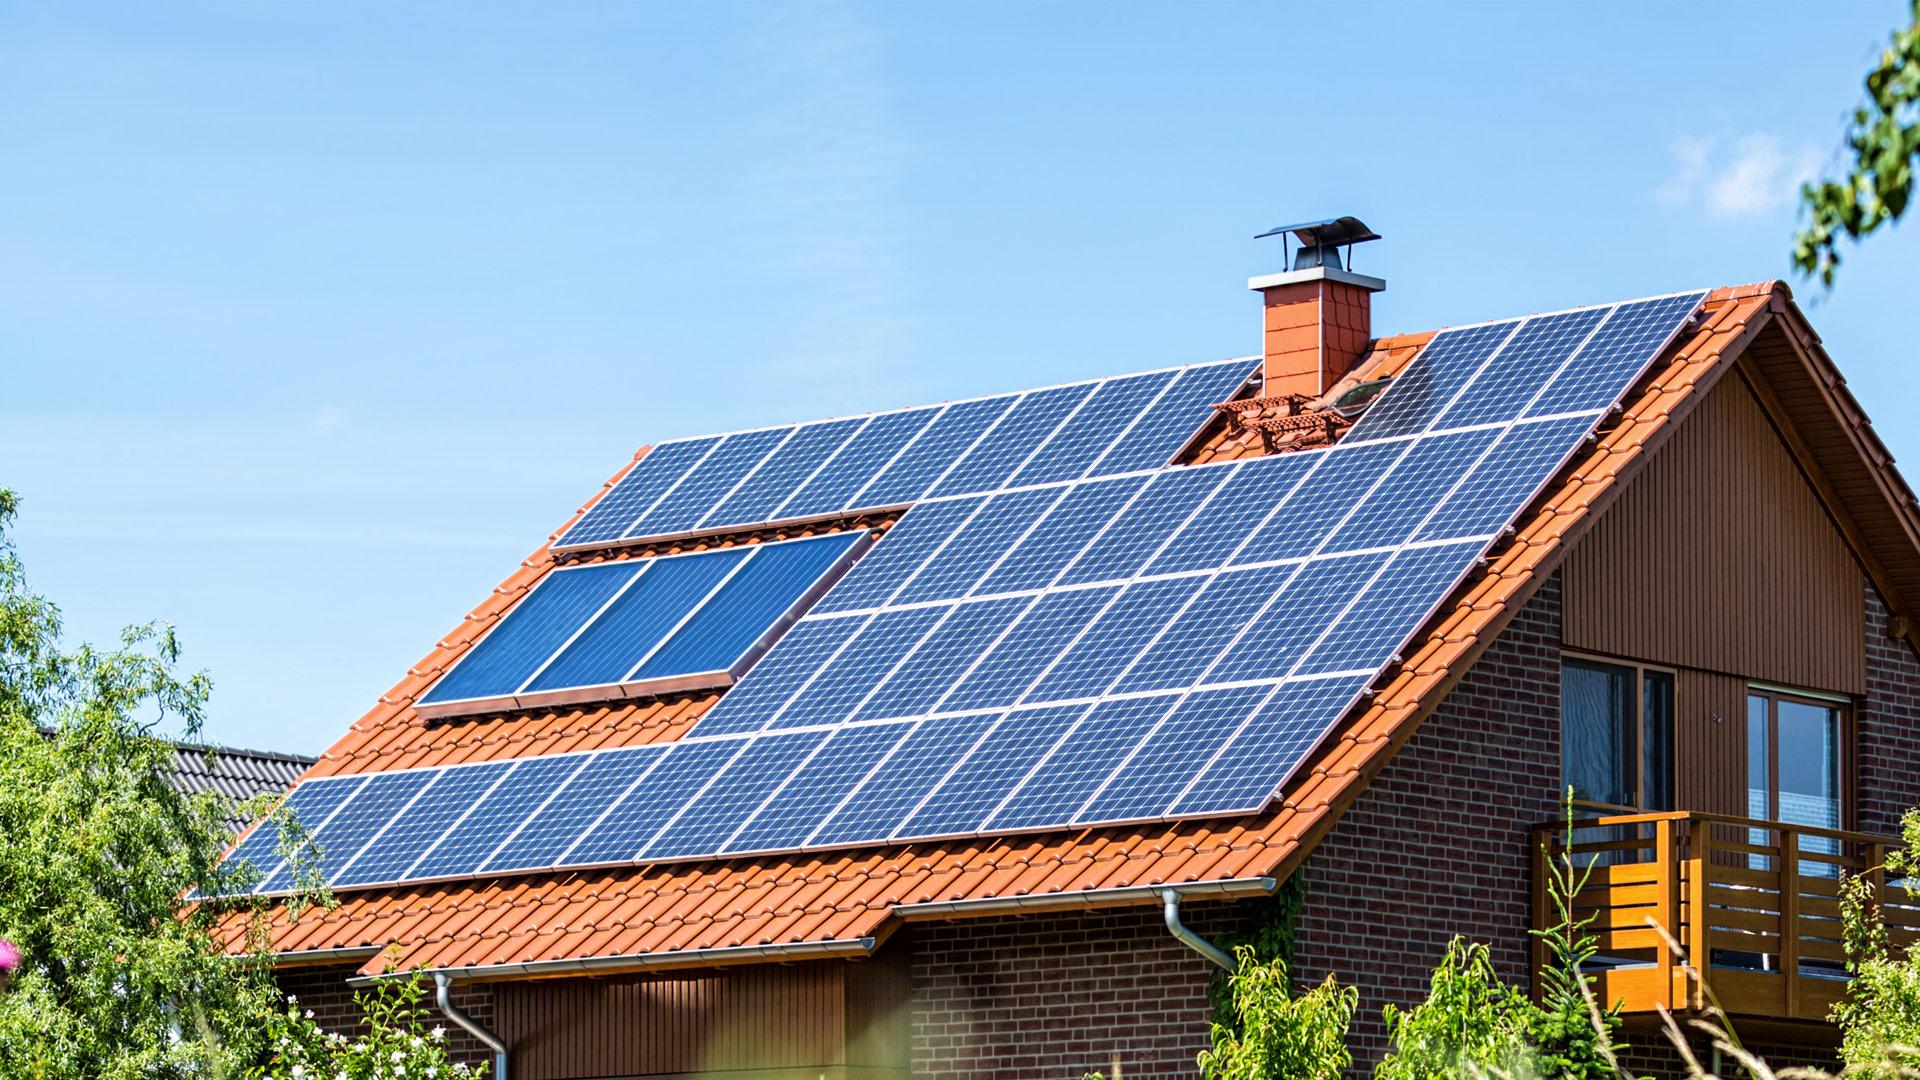 EAM Dach Solar